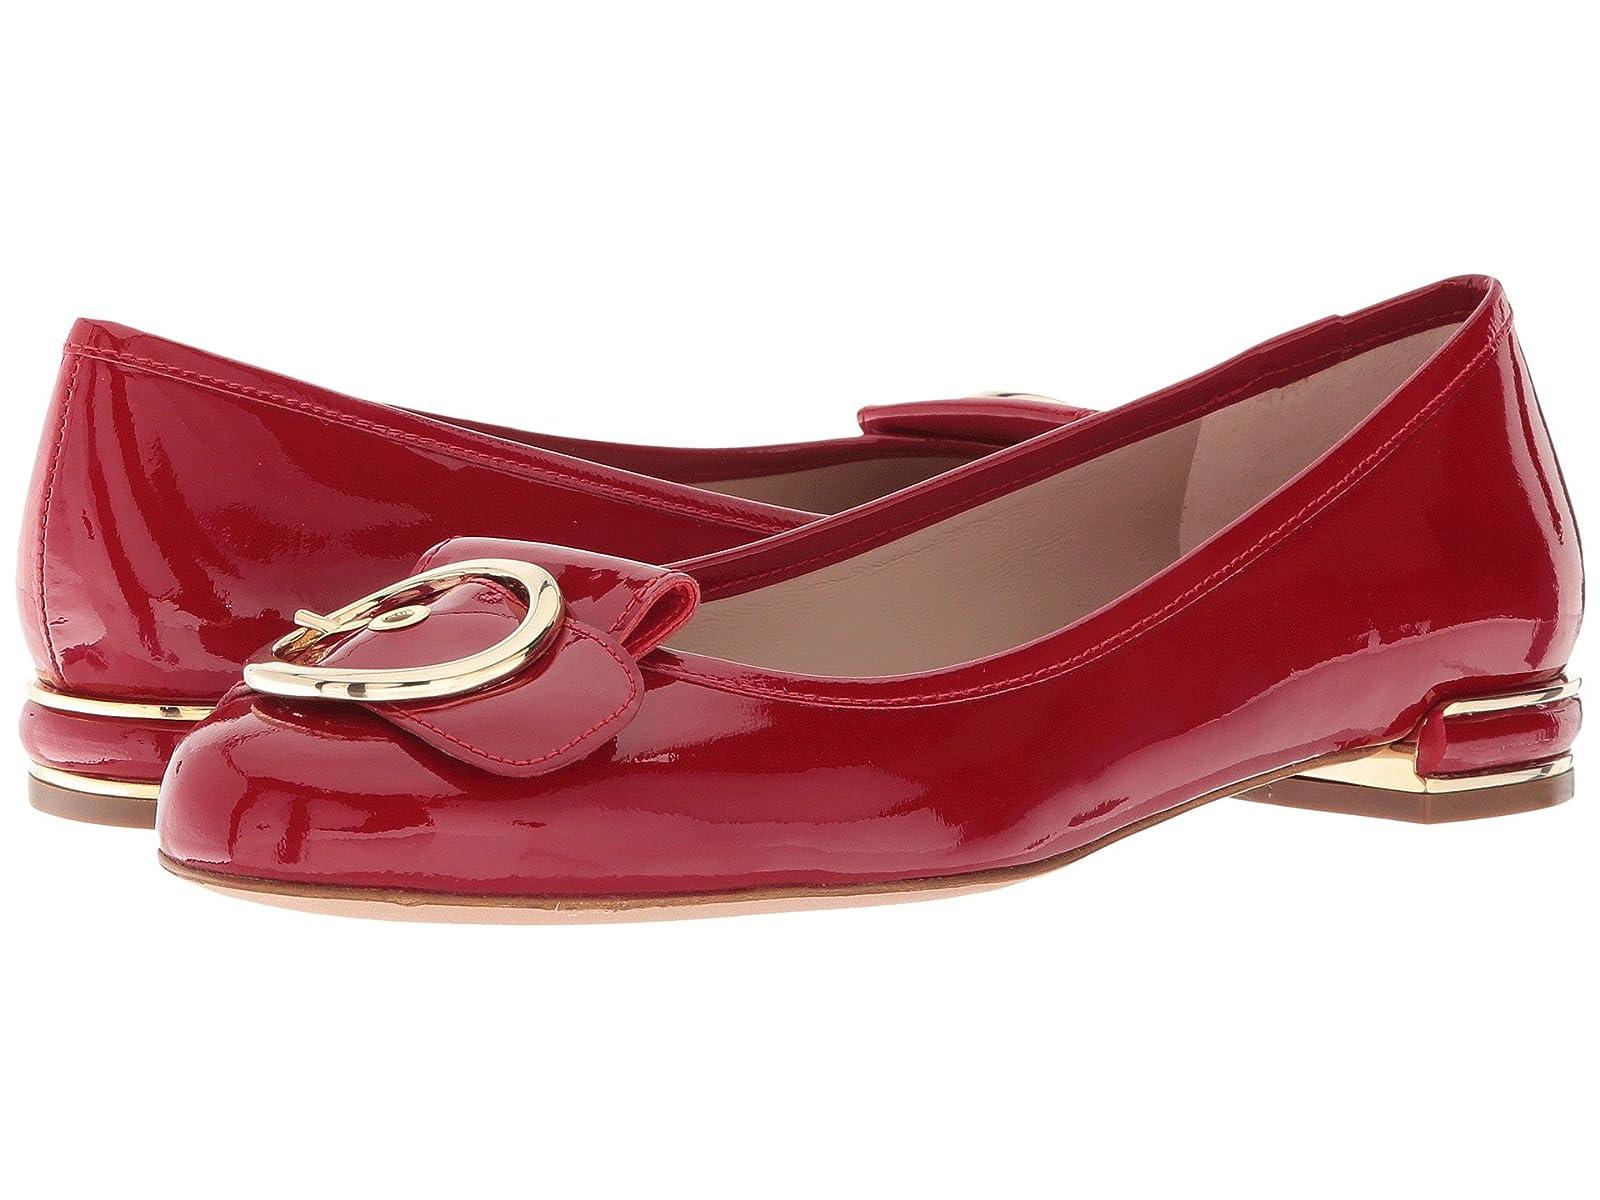 Stuart Weitzman LovebuckCheap and distinctive eye-catching shoes